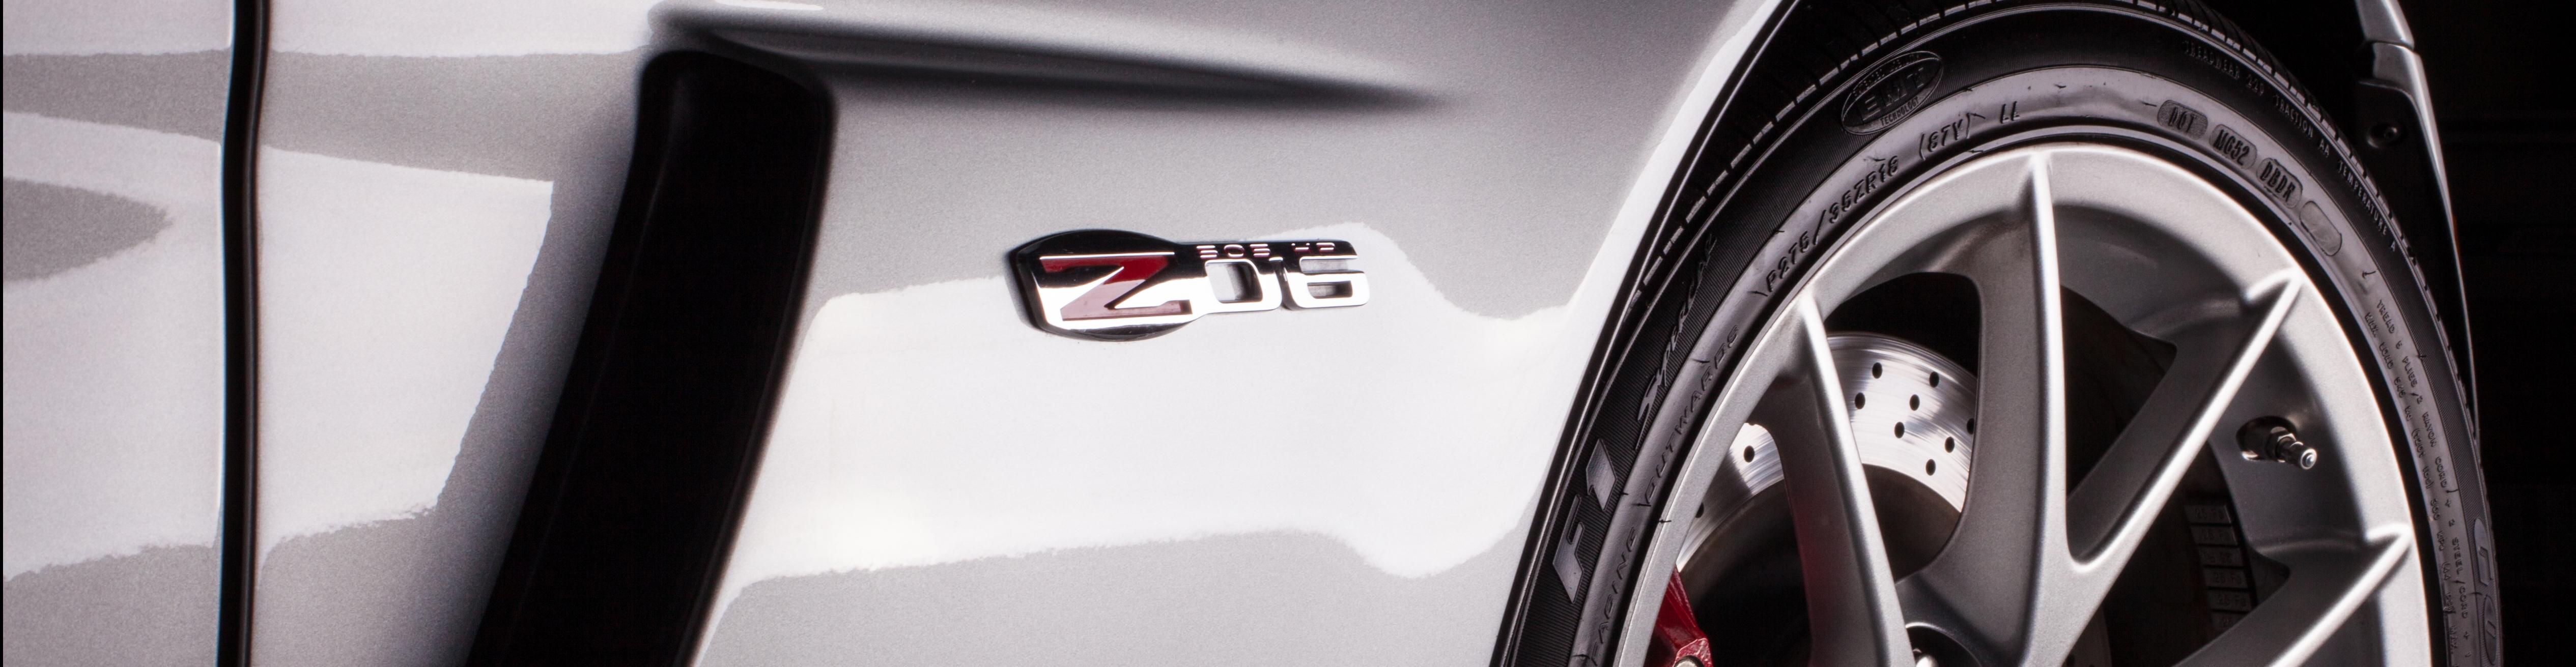 The 2009 Corvette Z06